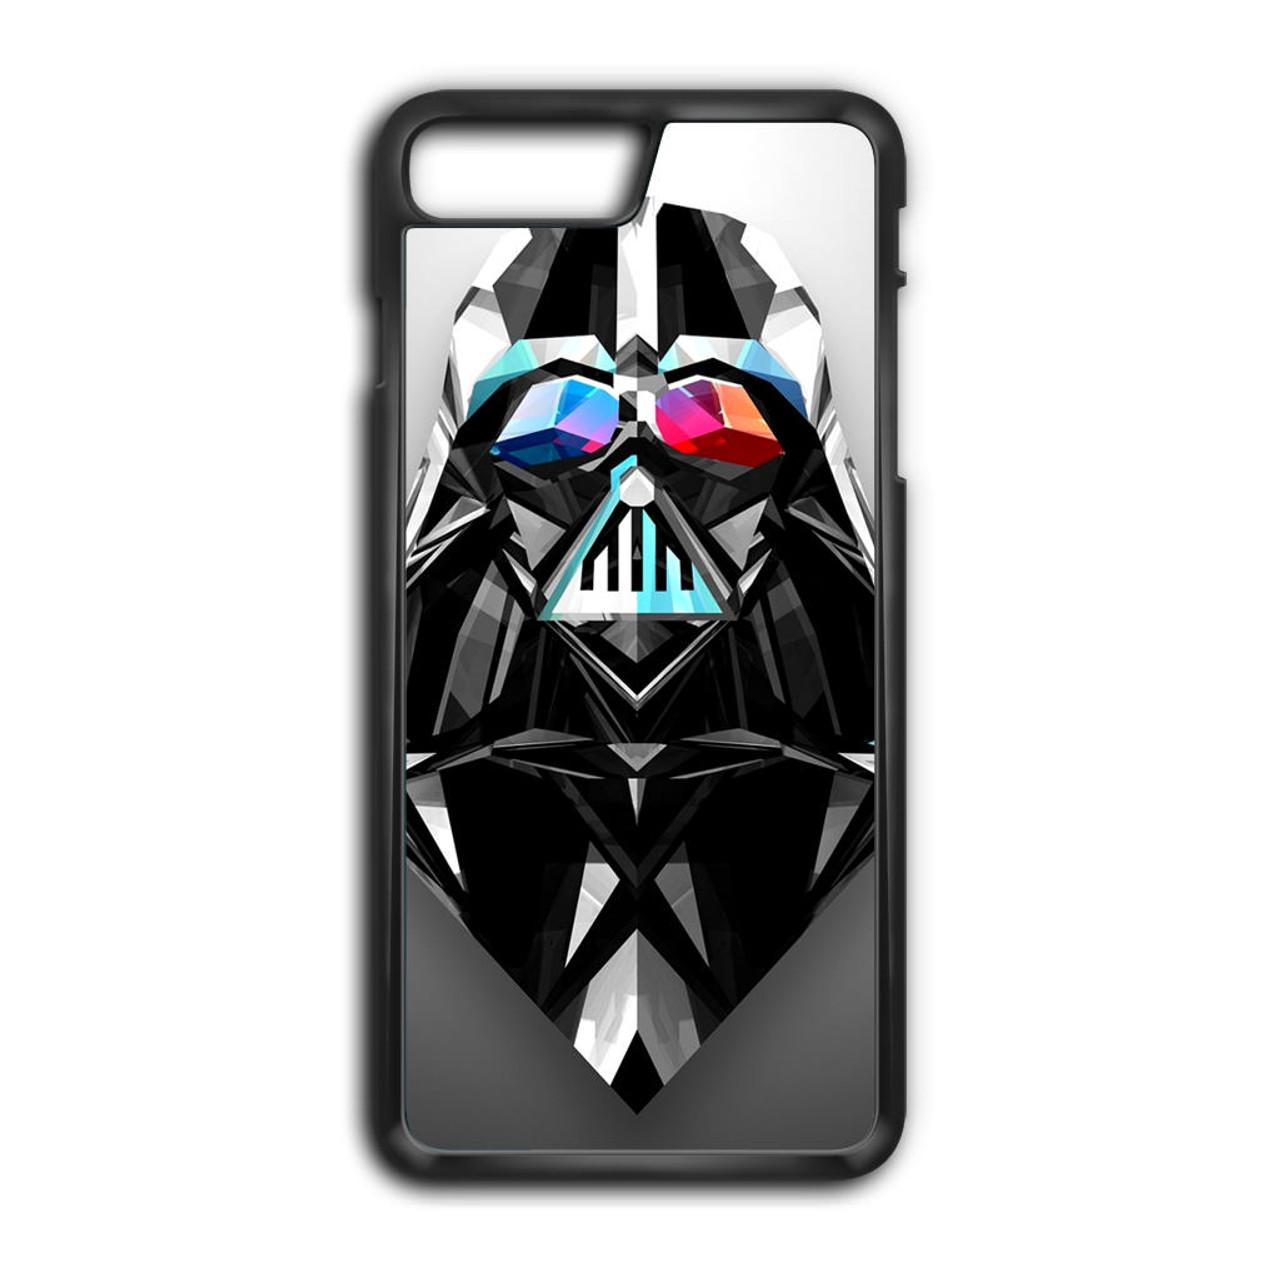 geometric iphone 8 case